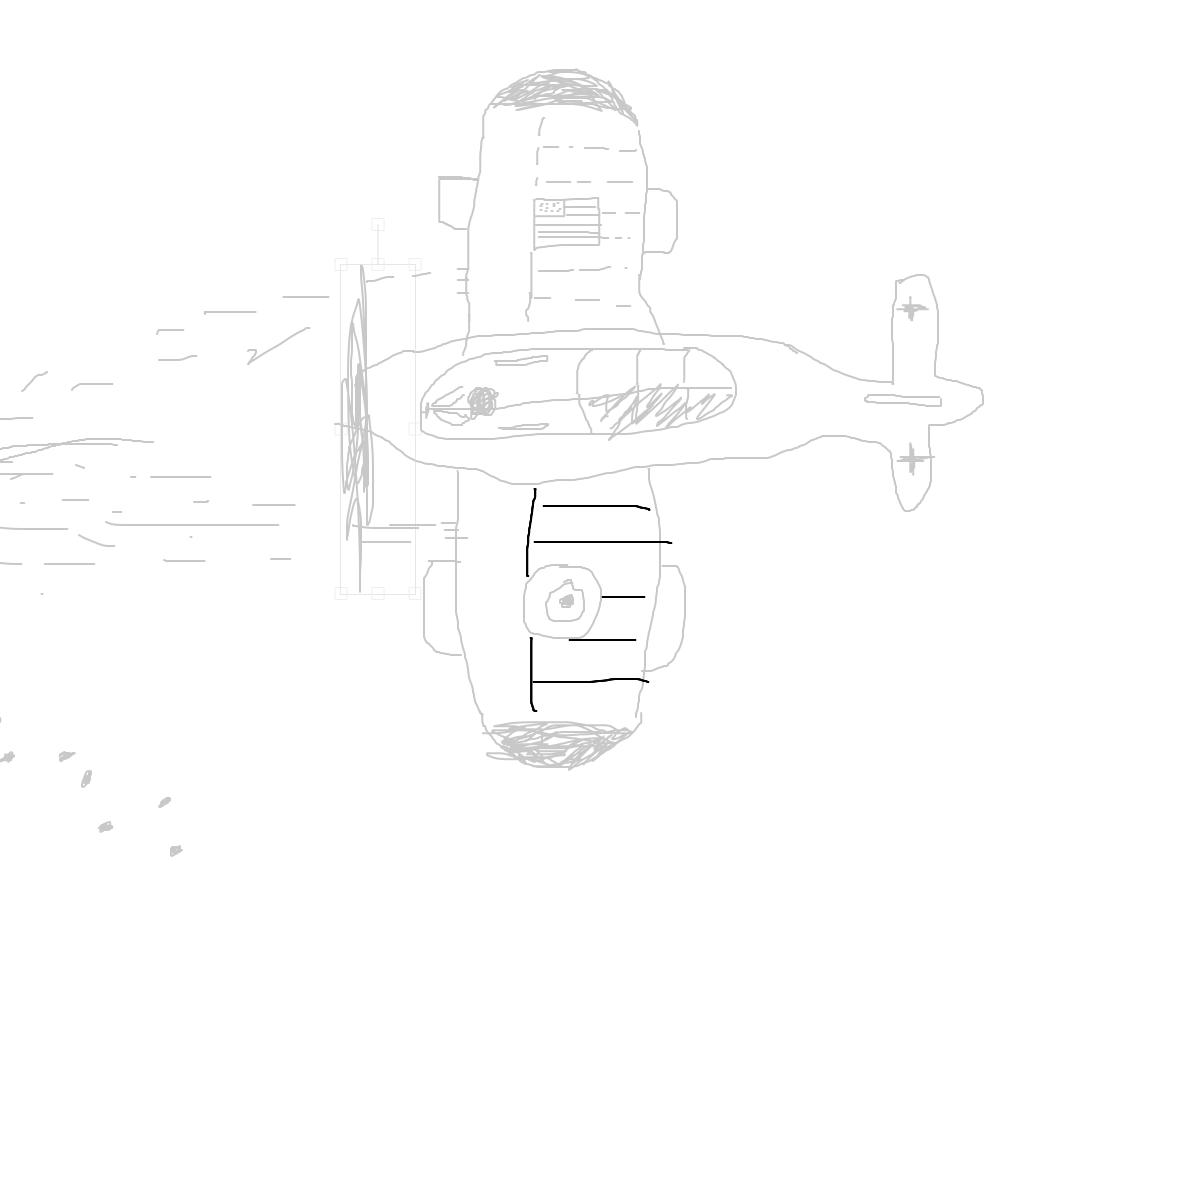 BAAAM drawing#6684 lat:76.5737457275390600lng: 16.3237457275390620